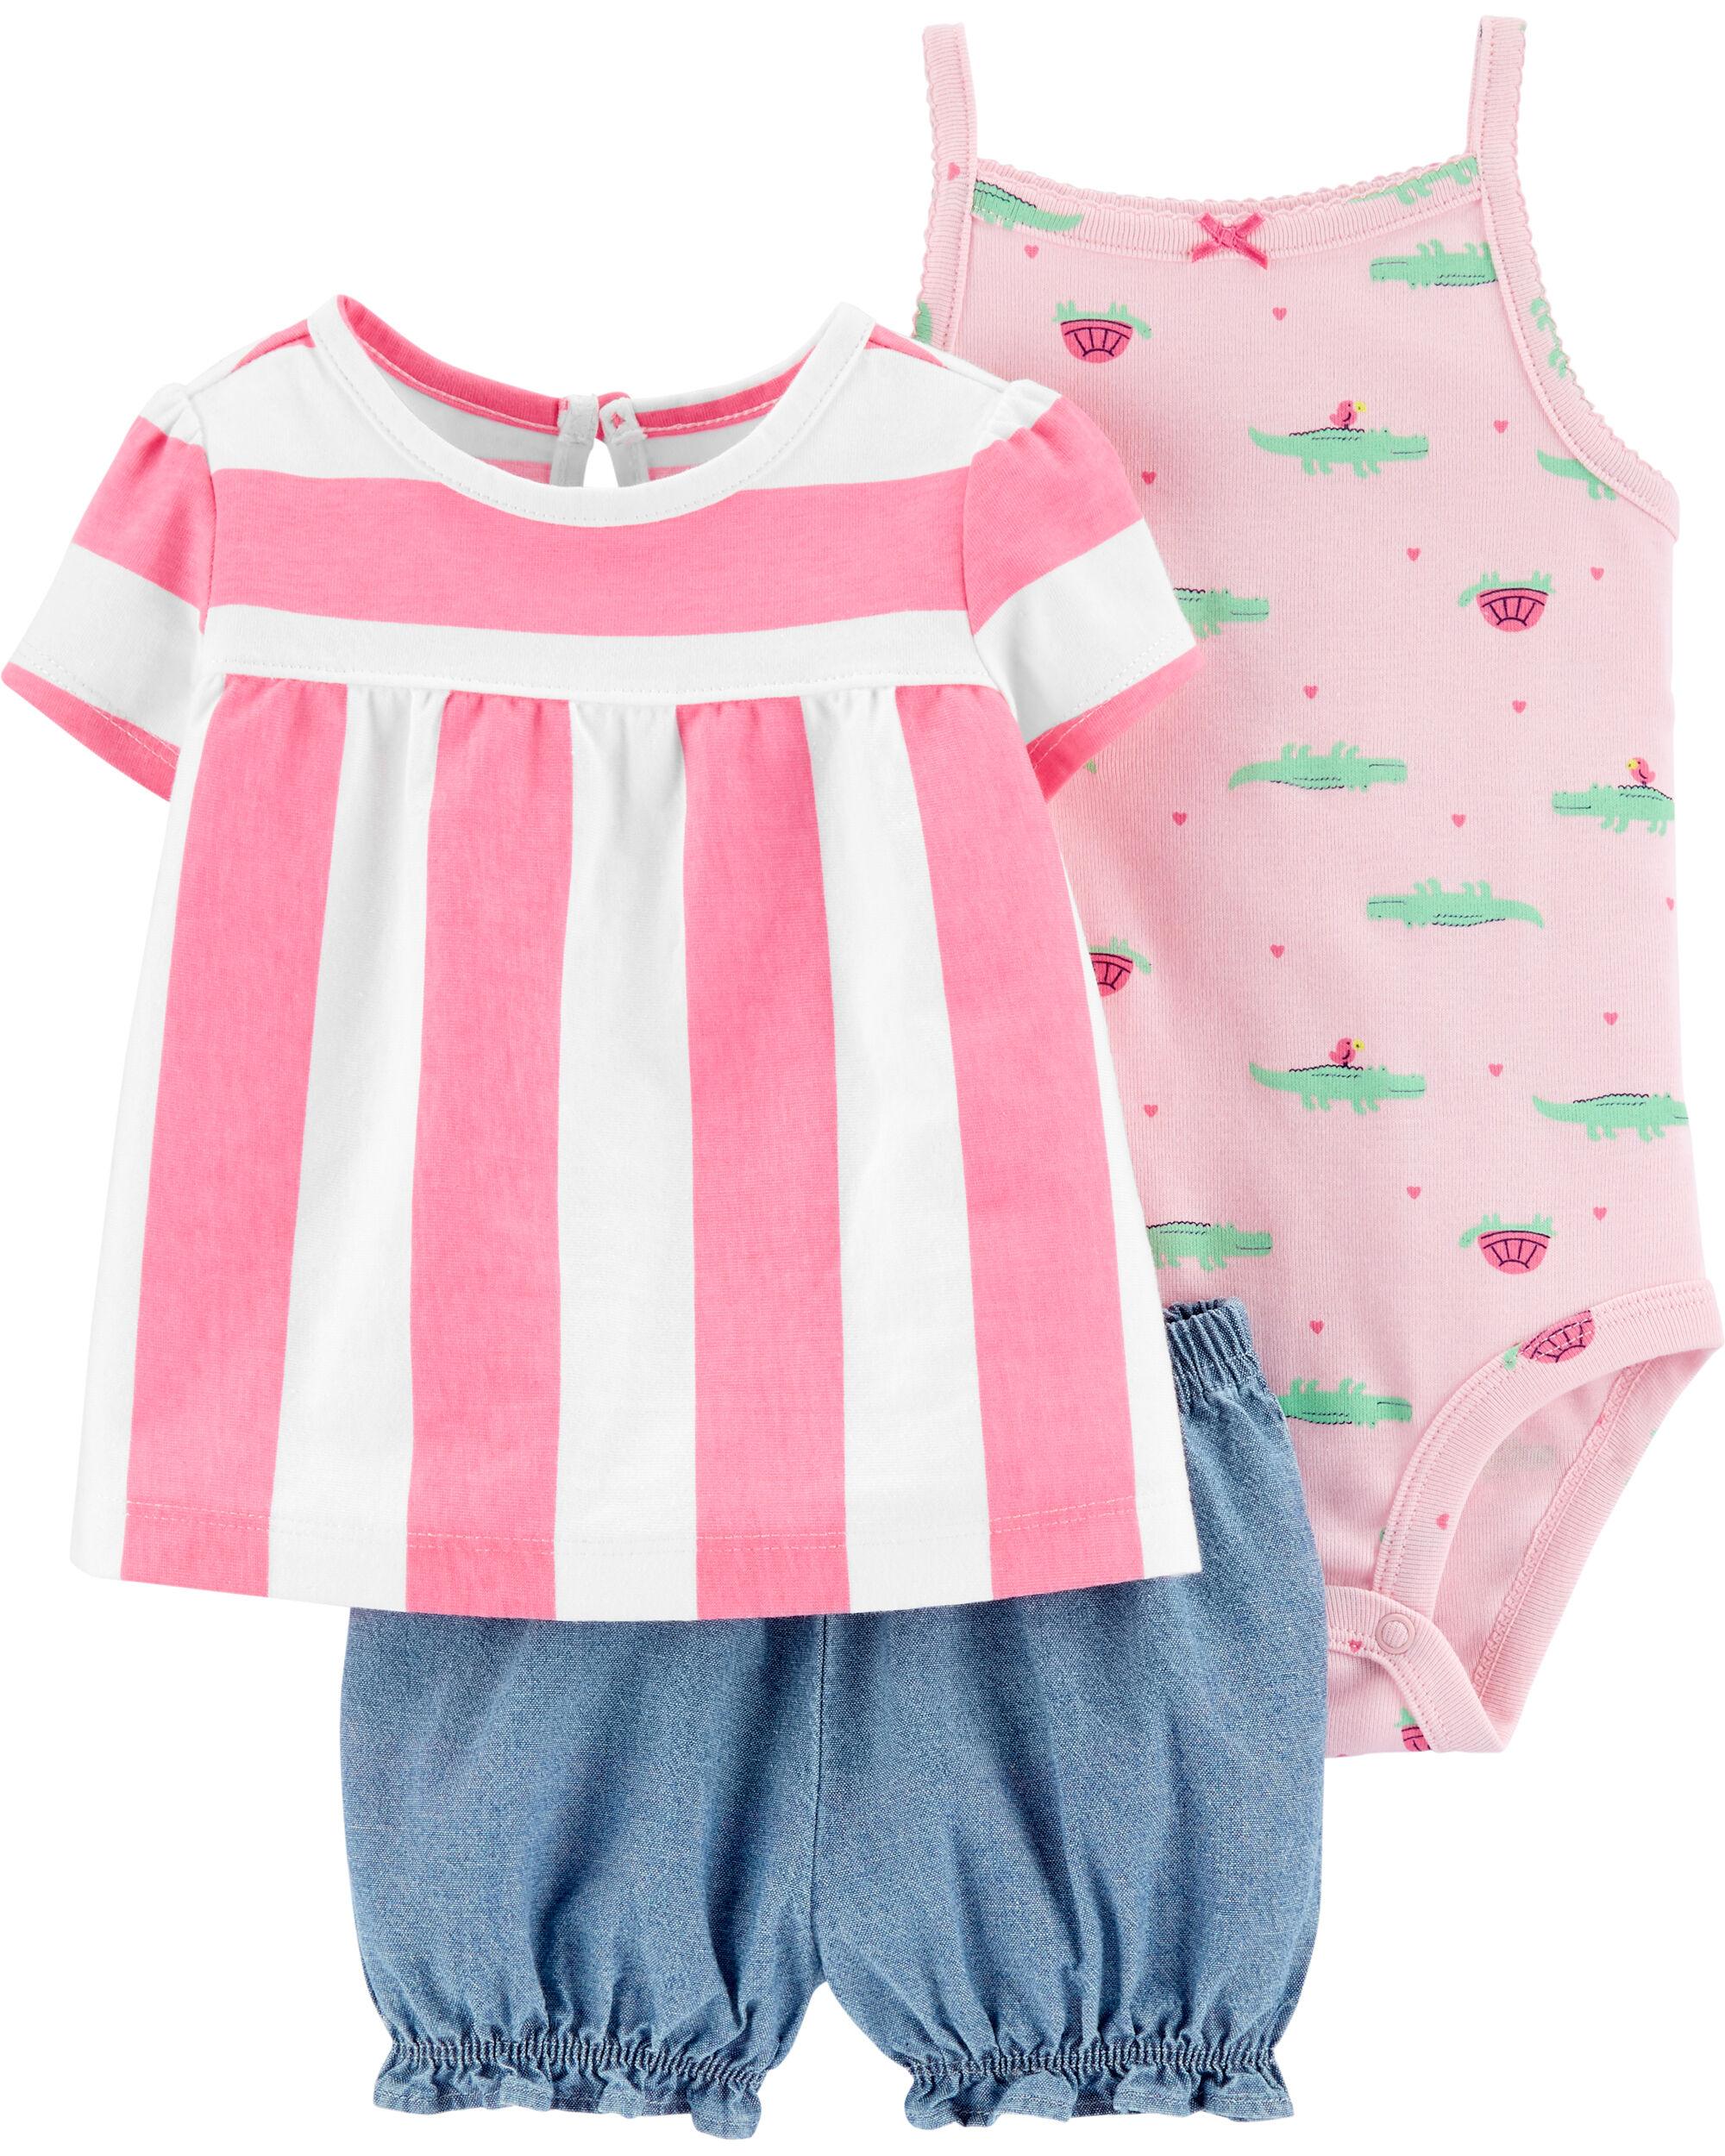 Toddler Carters Little Girls 3 Piece Striped Set